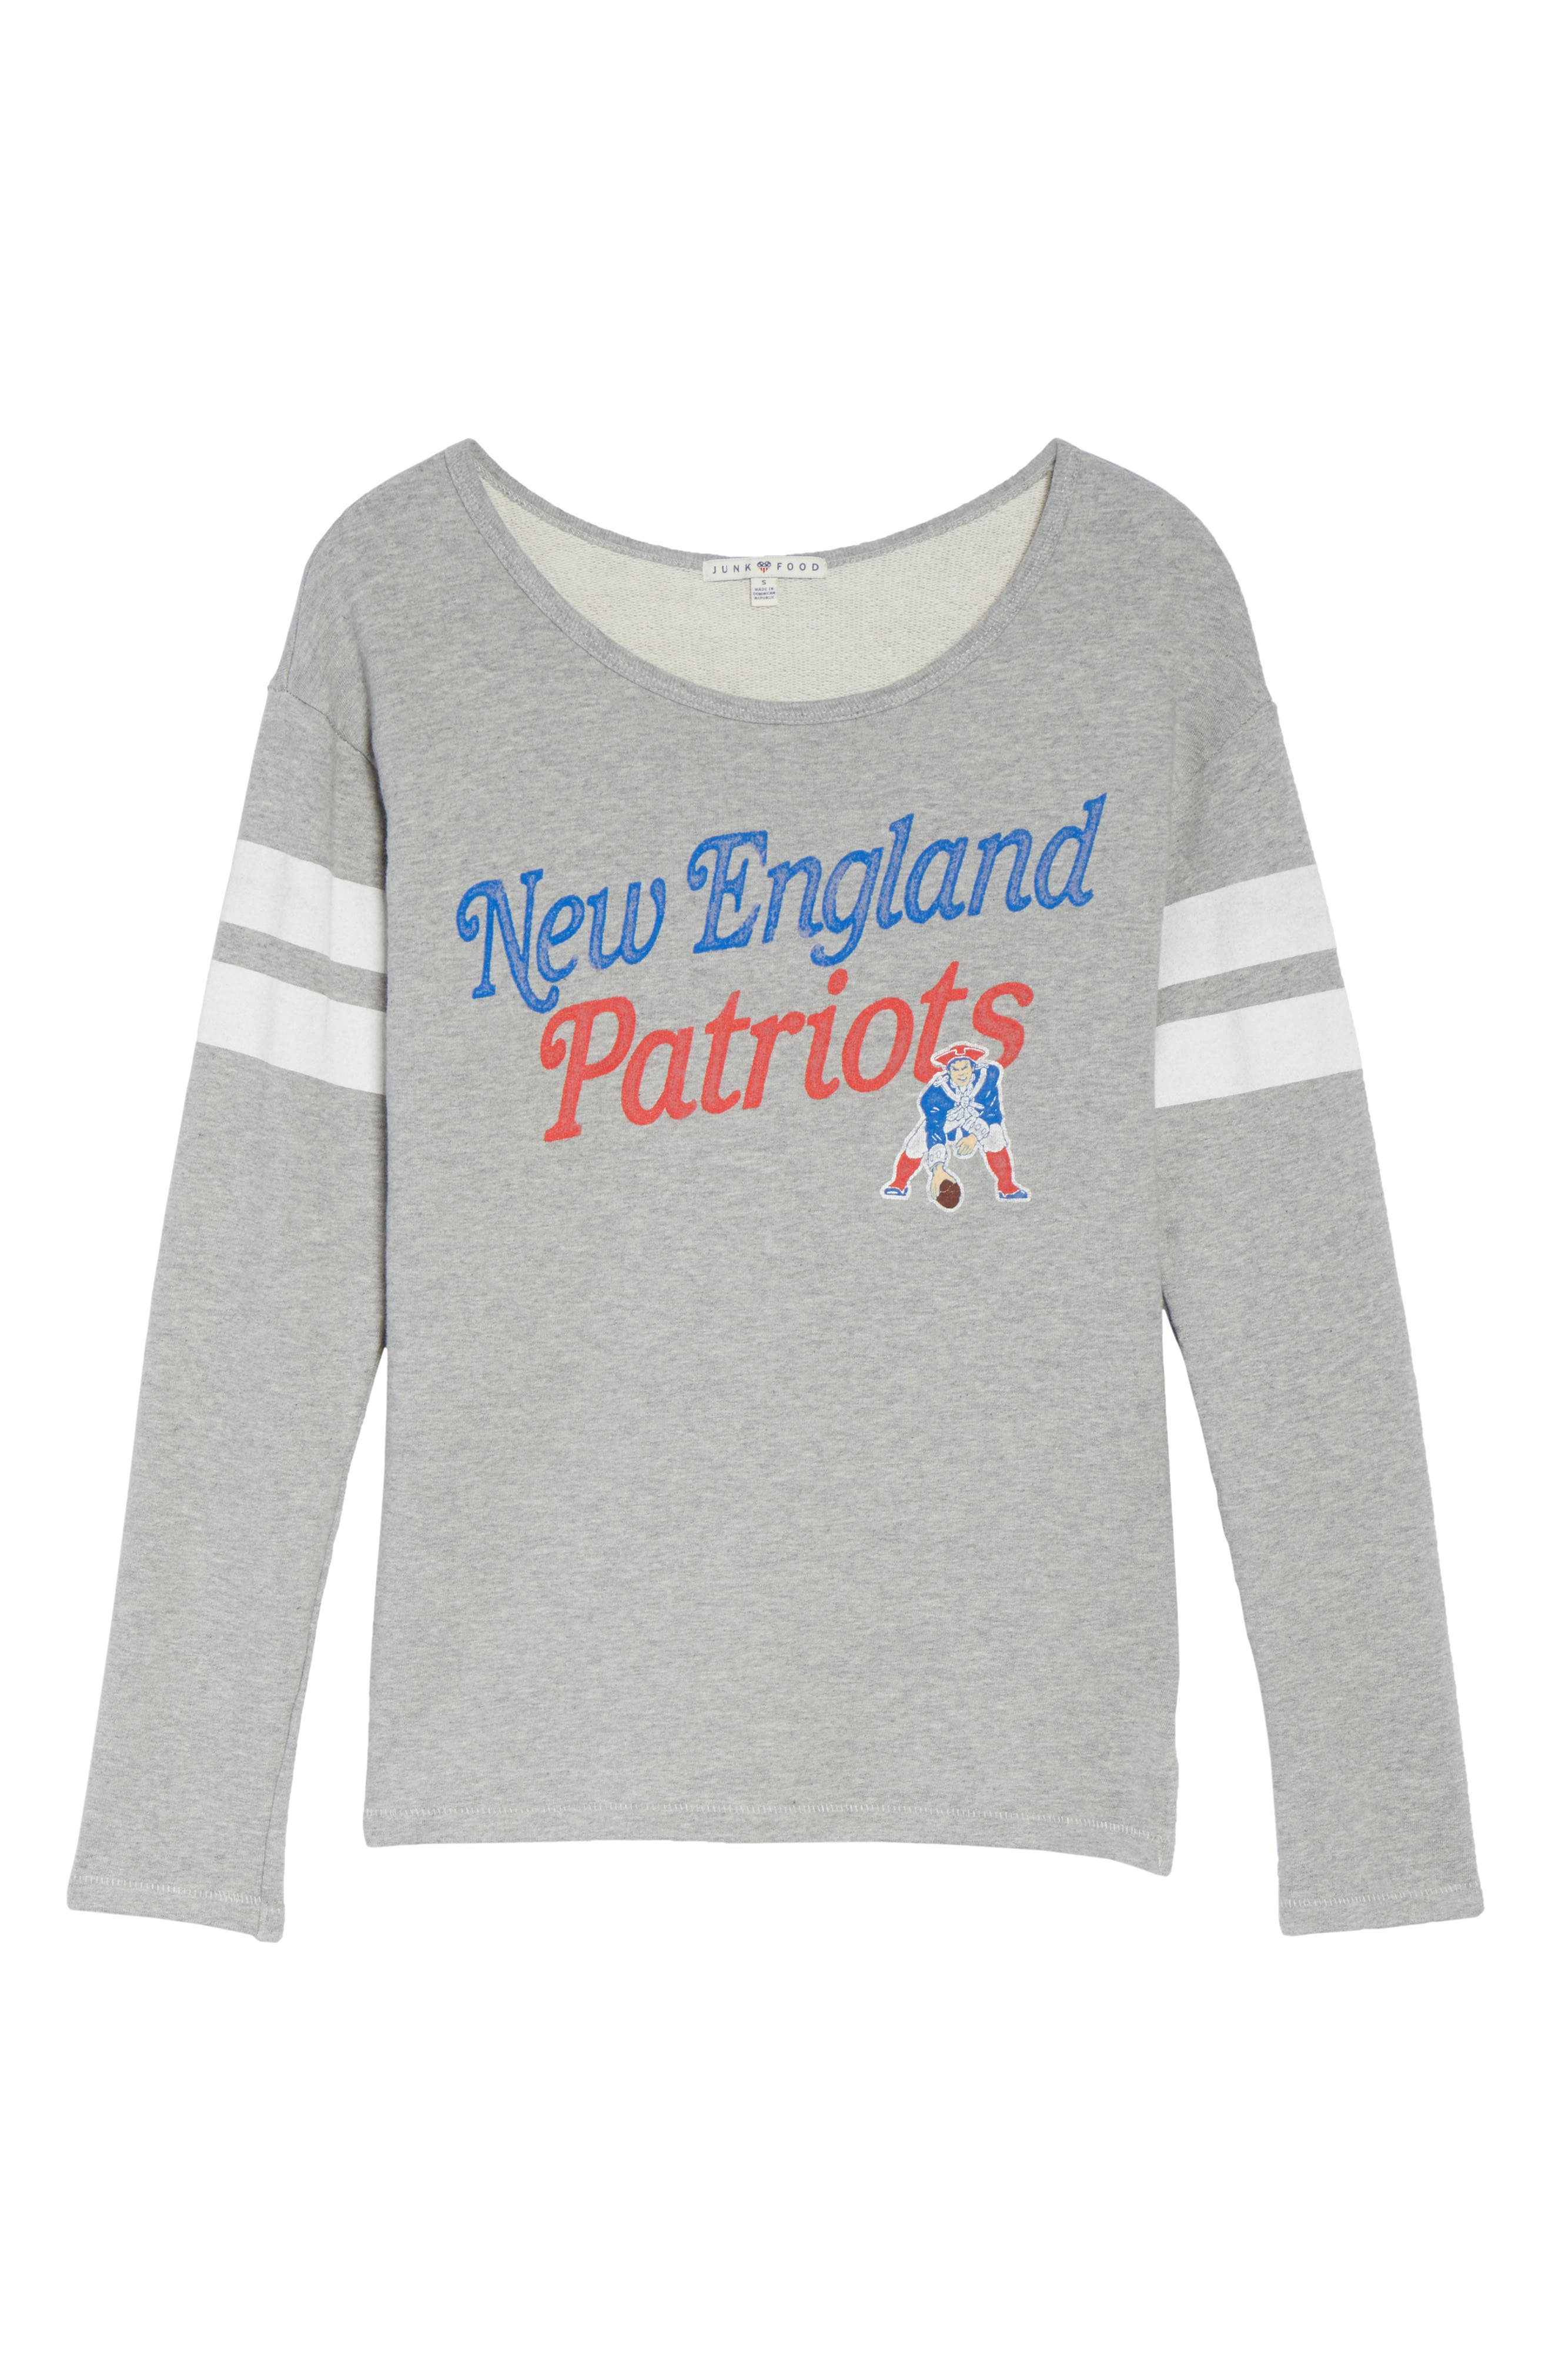 NFL New England Patriots Champion Sweatshirt,                             Alternate thumbnail 4, color,                             Heather Grey